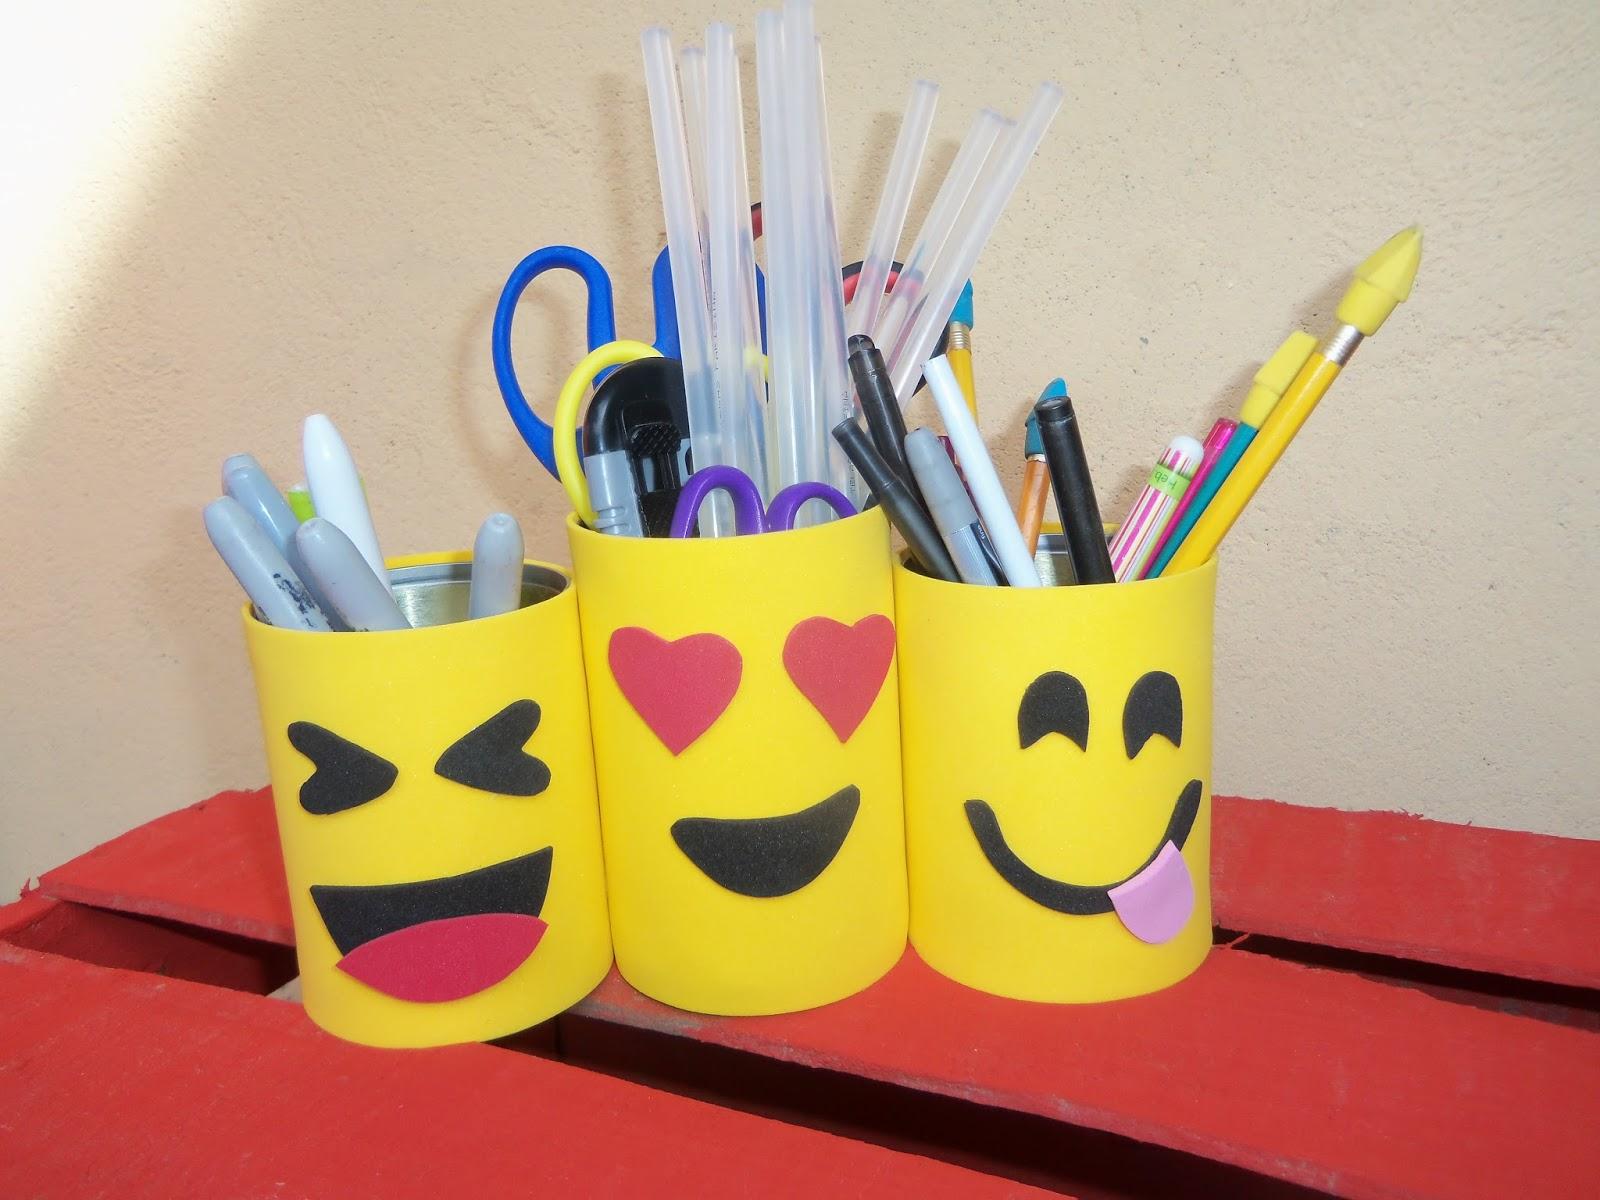 Miizzmagdiizz1 lapiceros de emojis manualidades de - Lapiceros reciclados manualidades ...